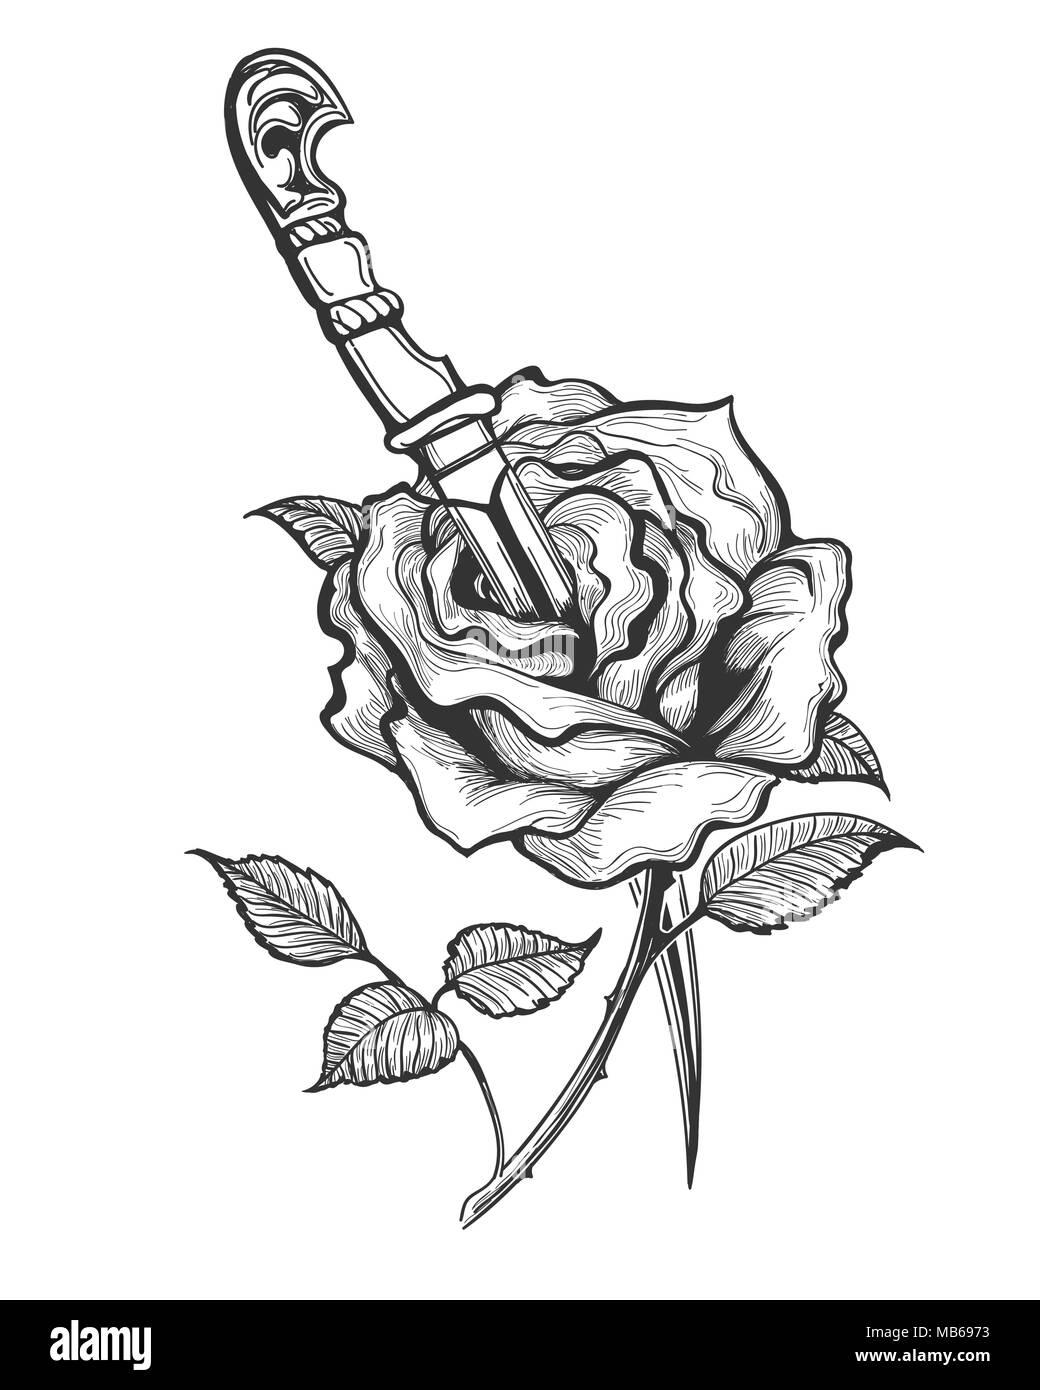 Tattoo of Rose Flower piersed by Dagger. Vector illustration. - Stock Vector